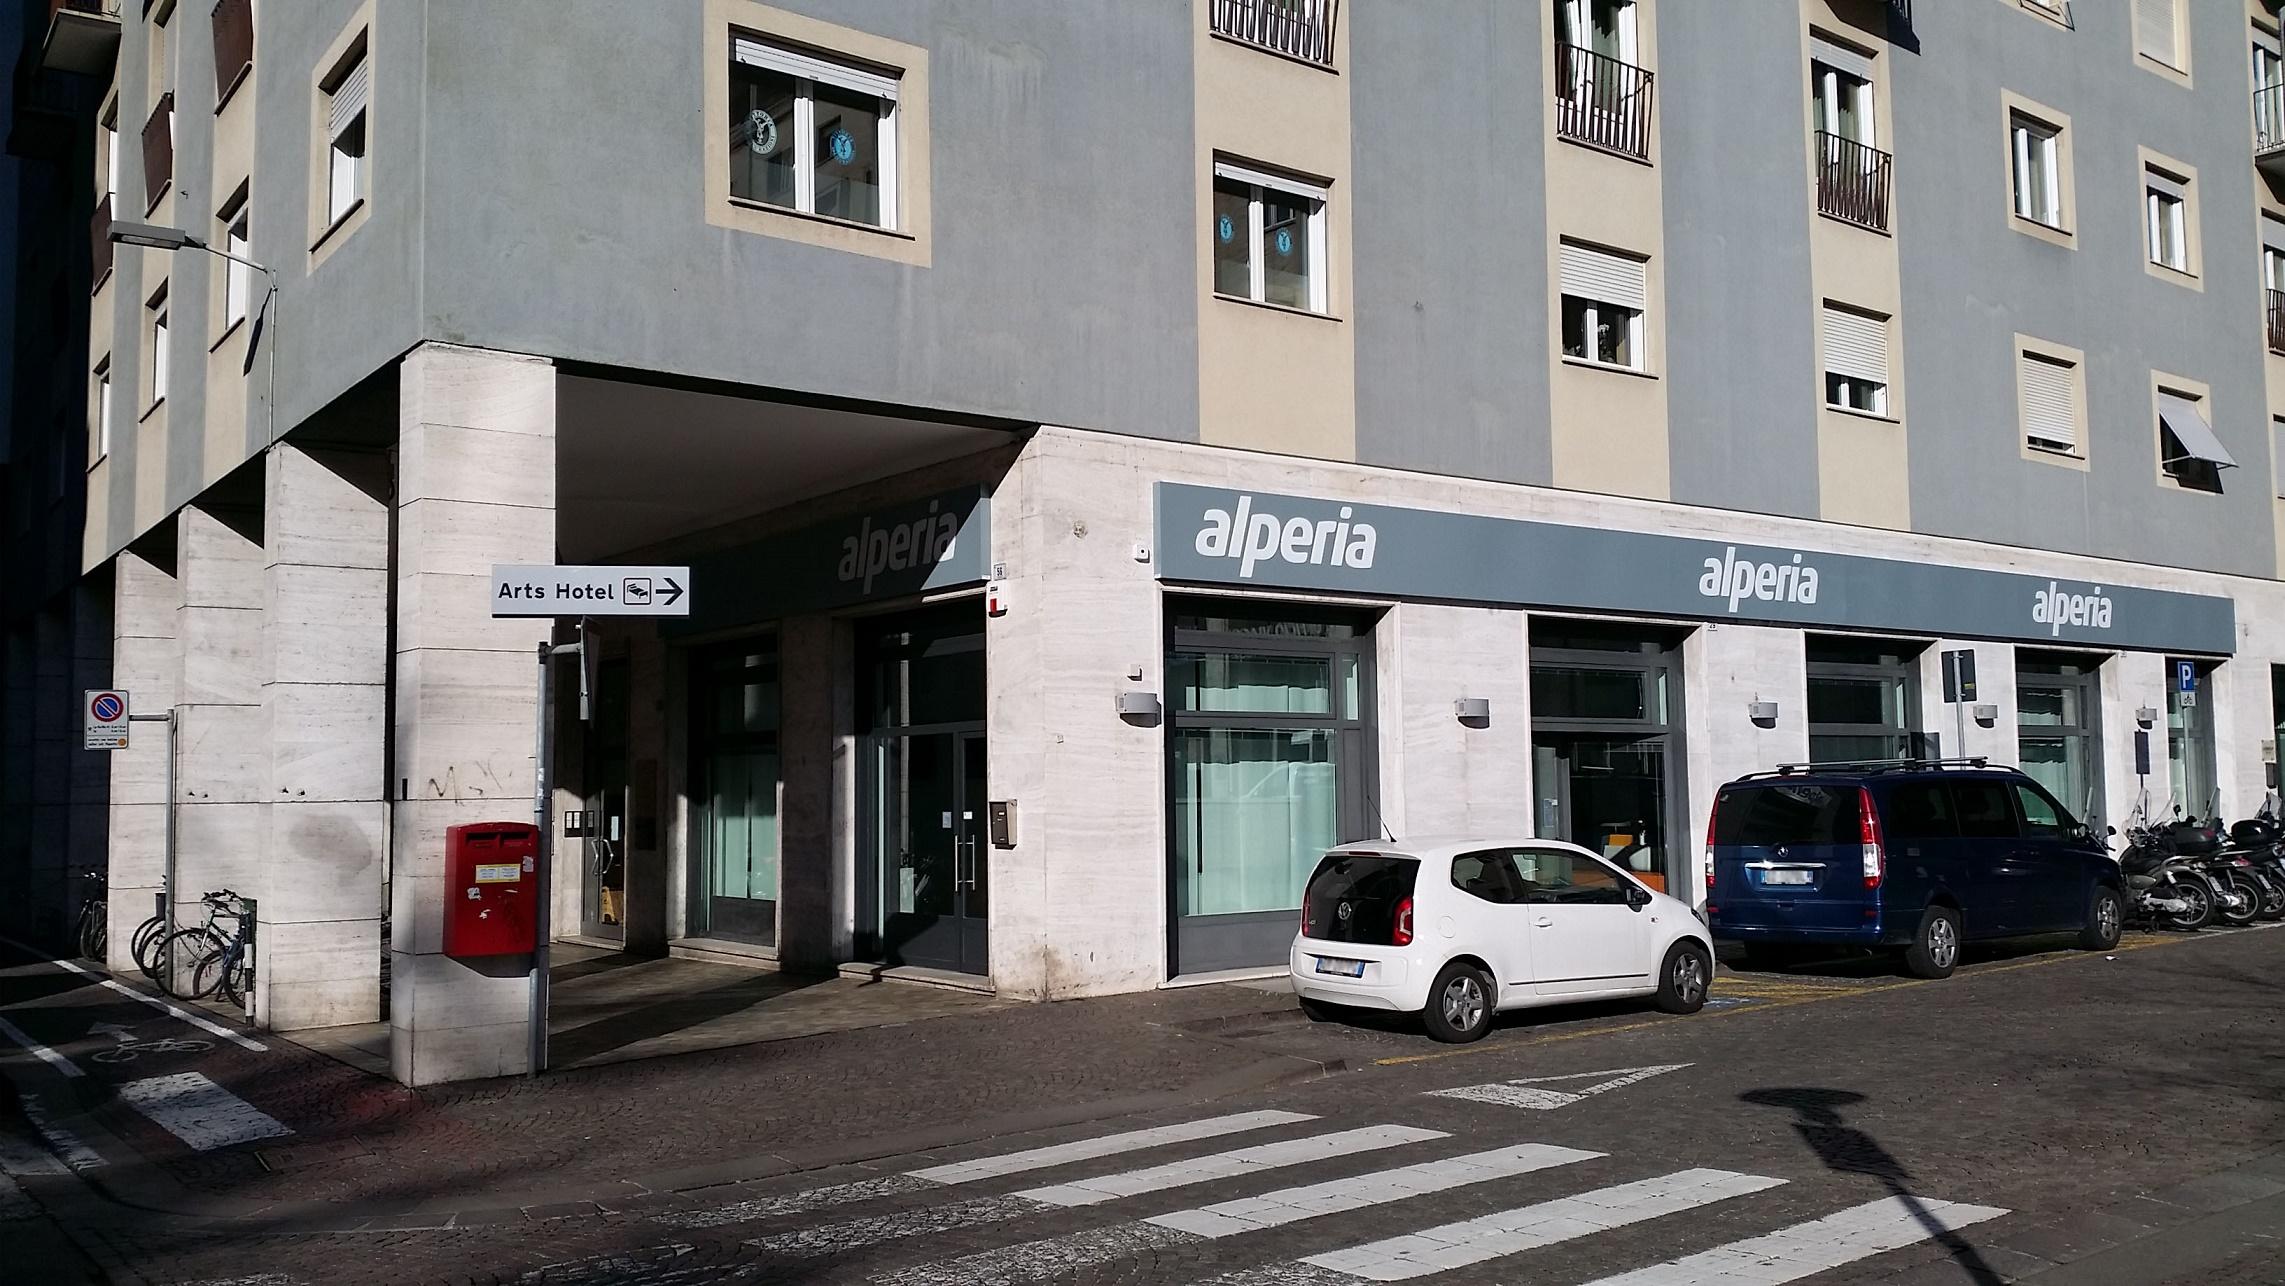 alperia sede Bolzano